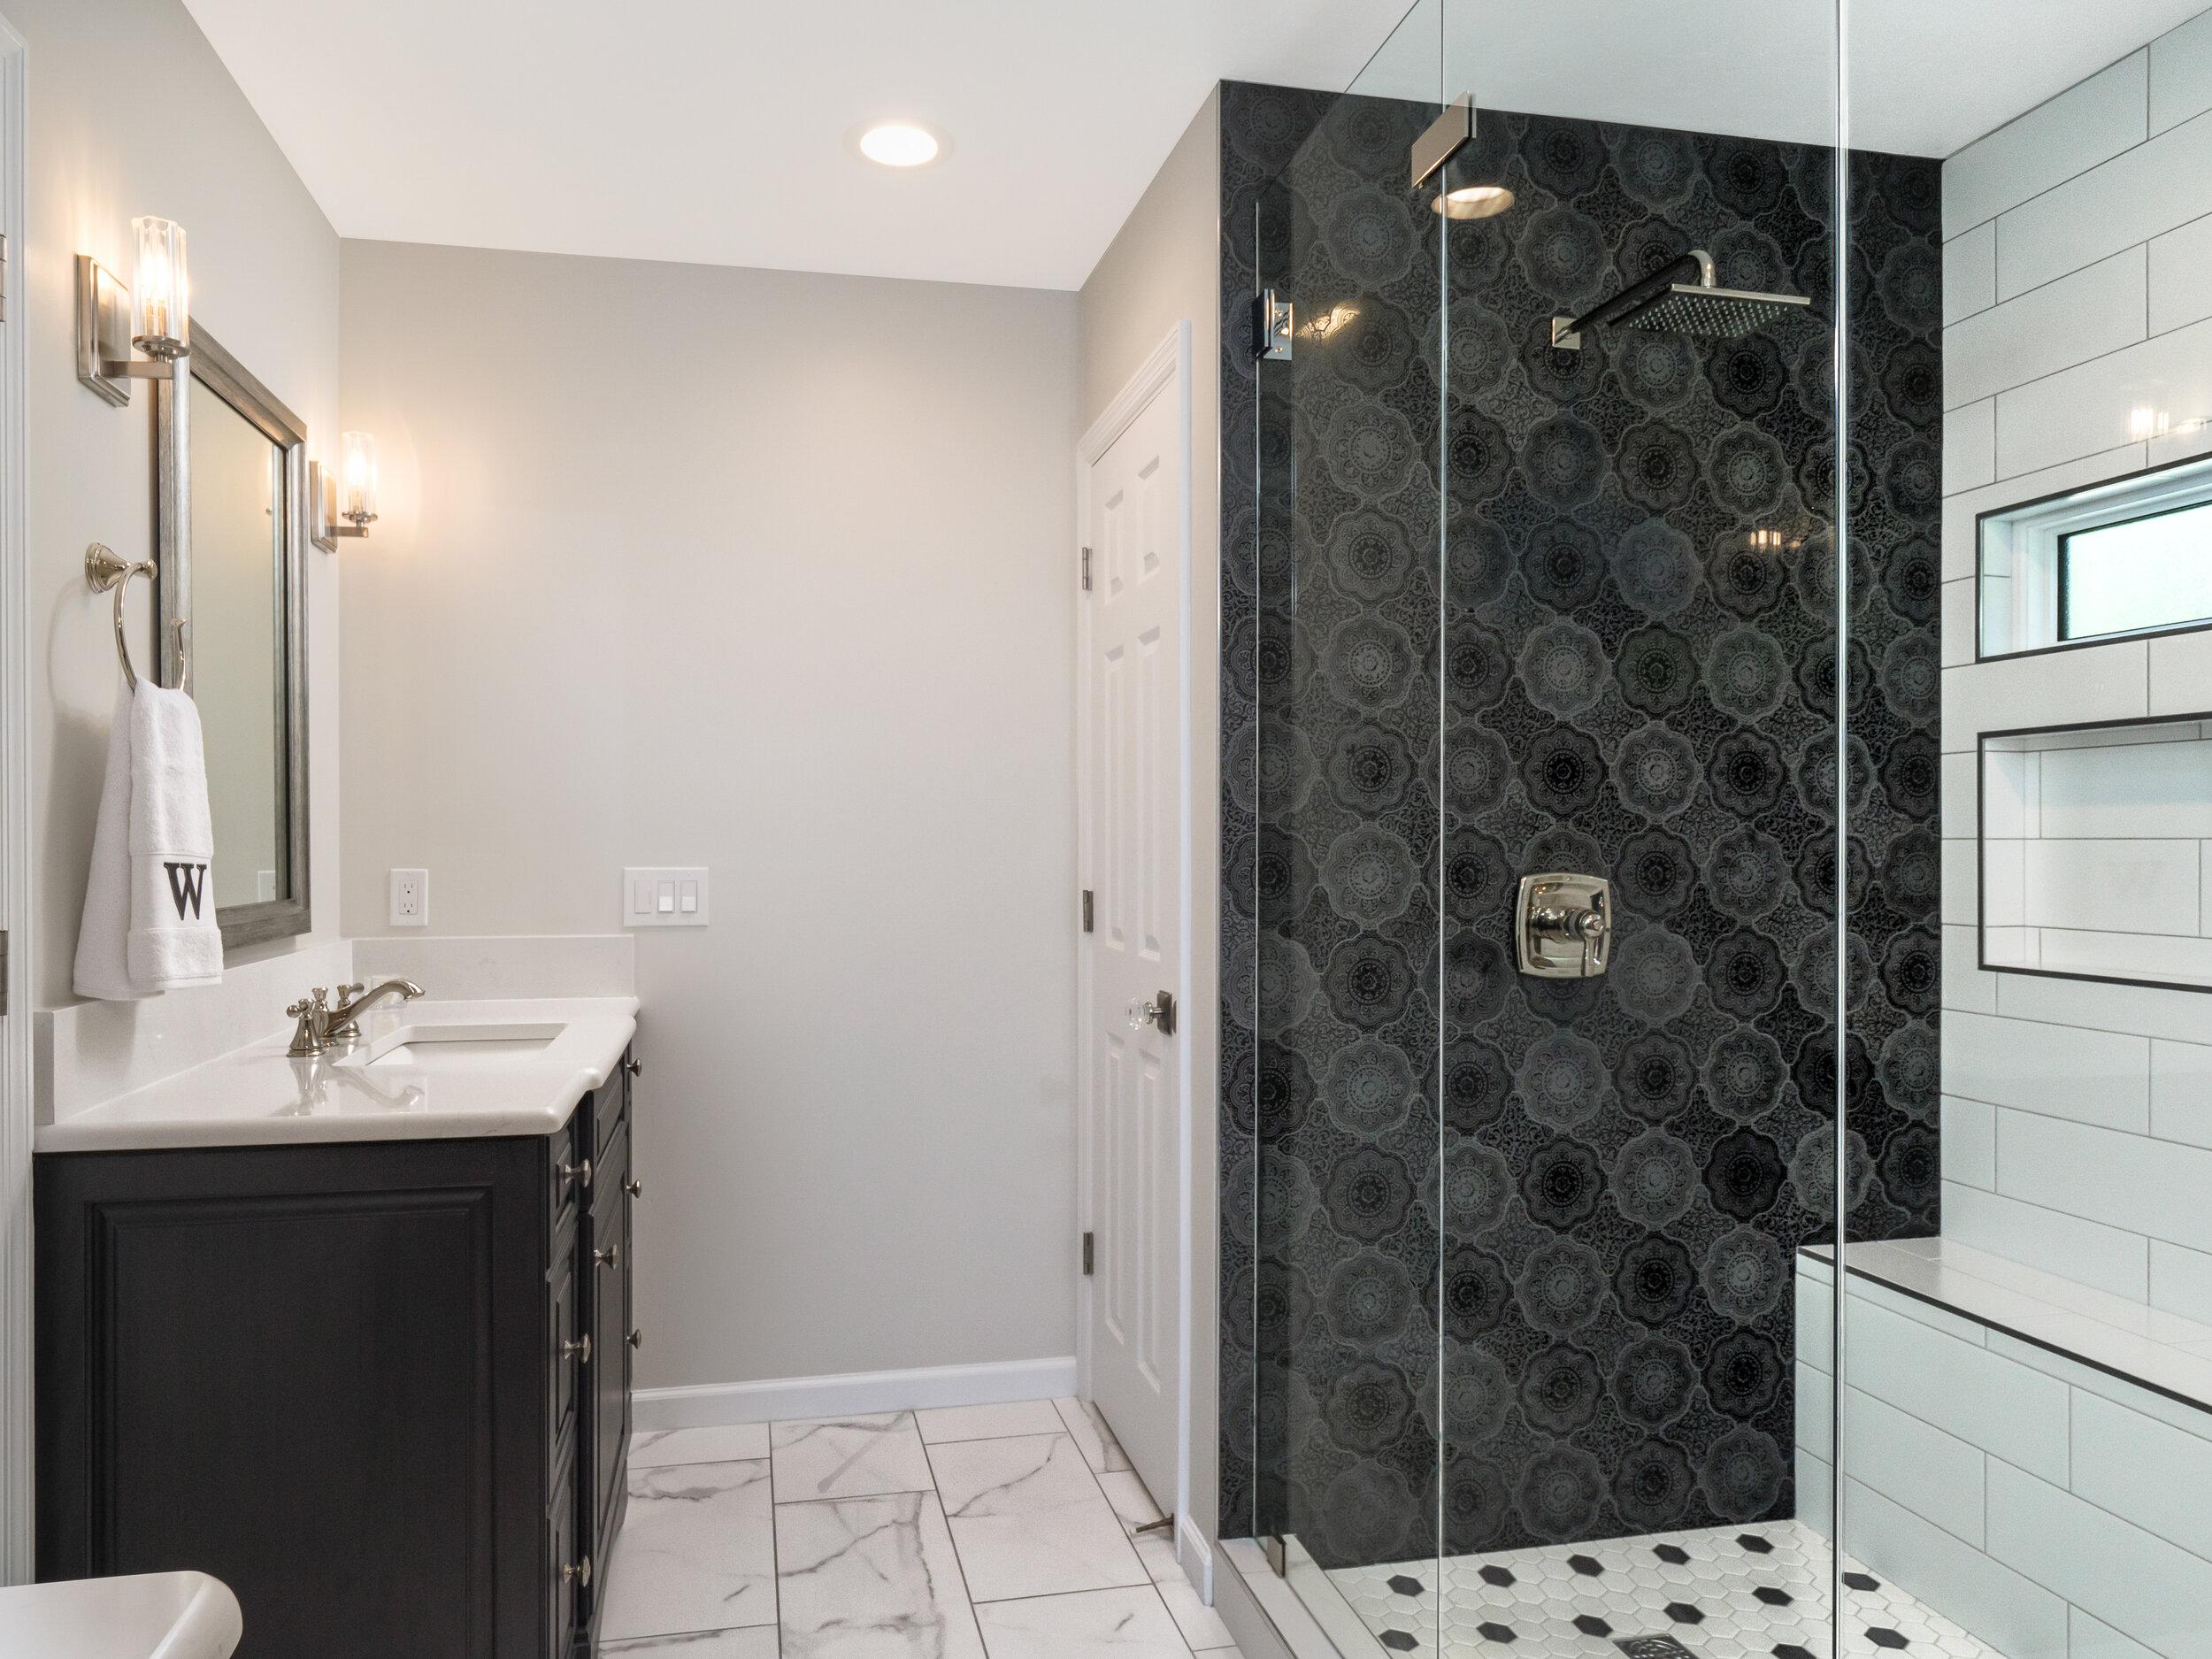 Worthington bath shower plumbinng.jpg